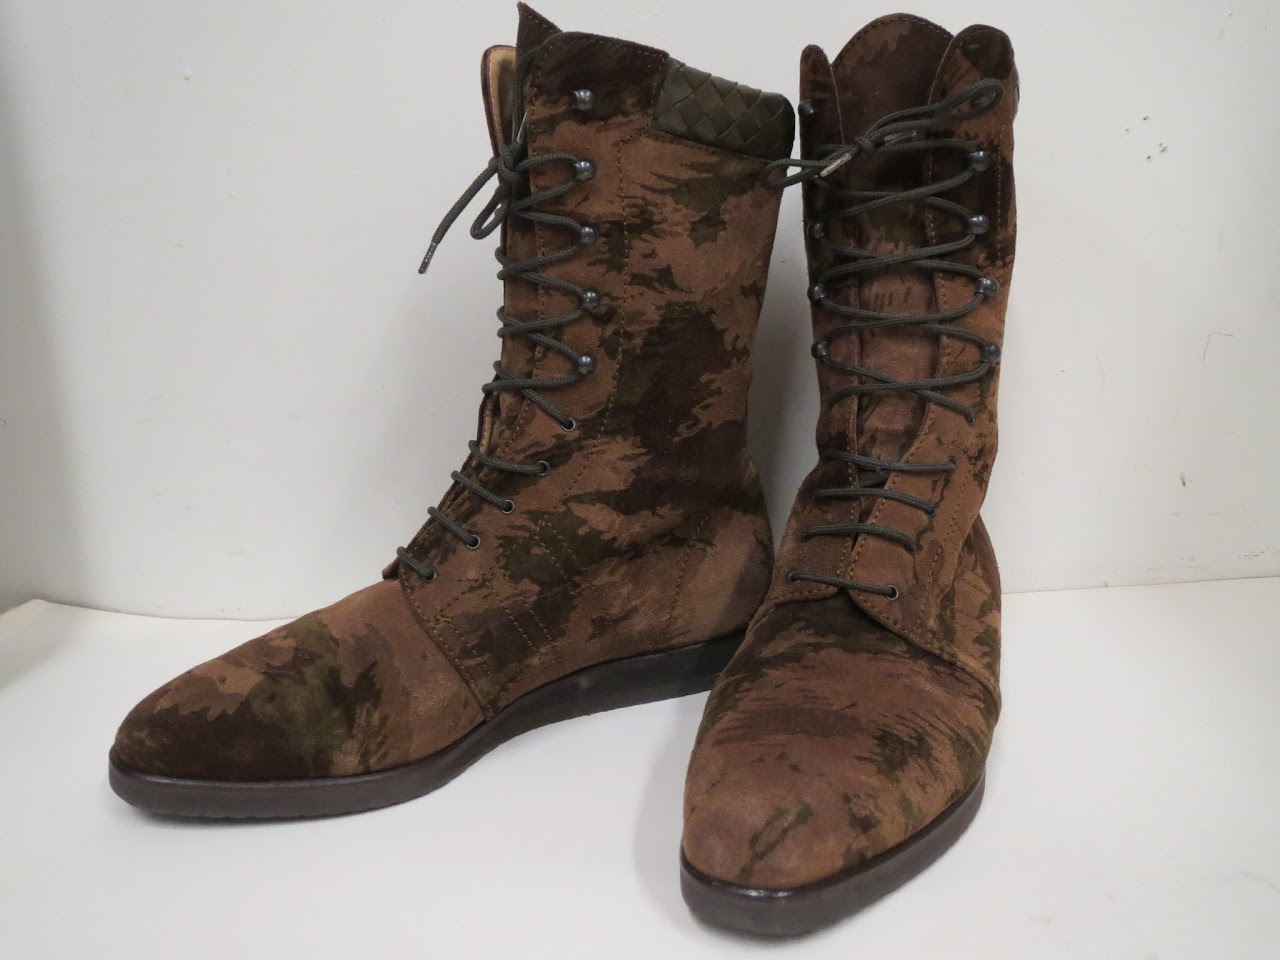 Bottega Veneta Camo Boots